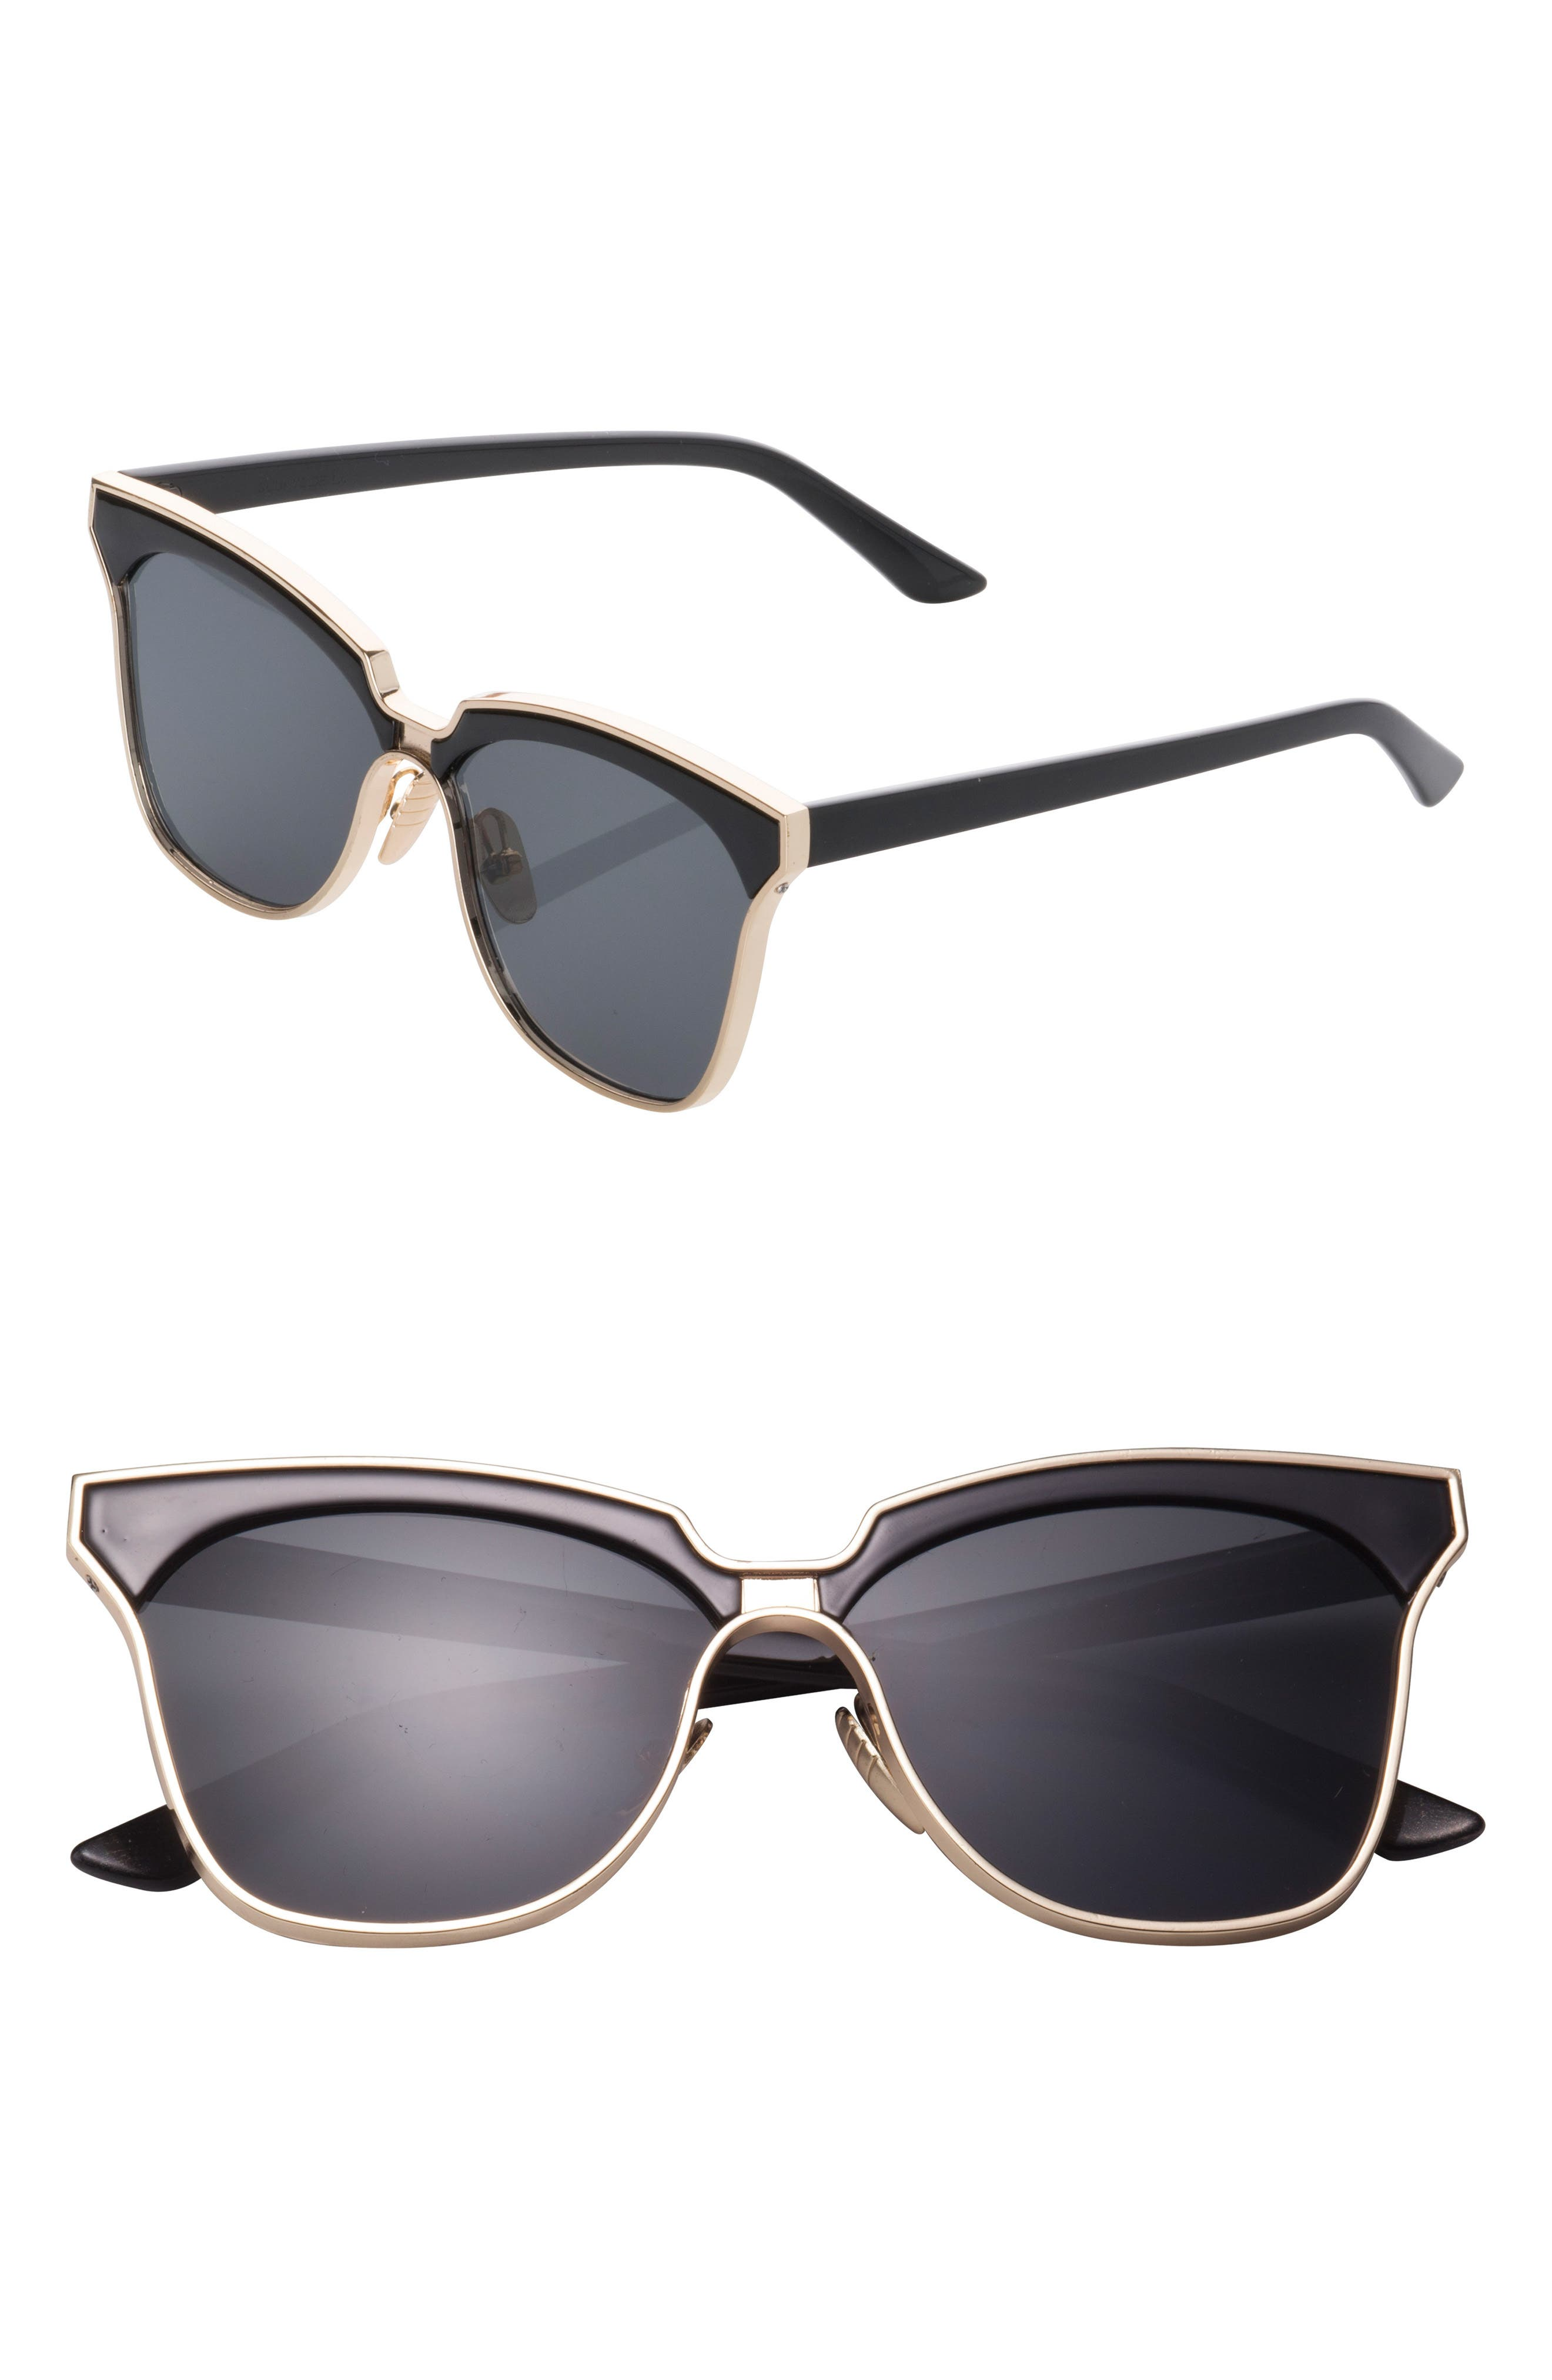 SunnySide LA 61mm Angular Sunglasses